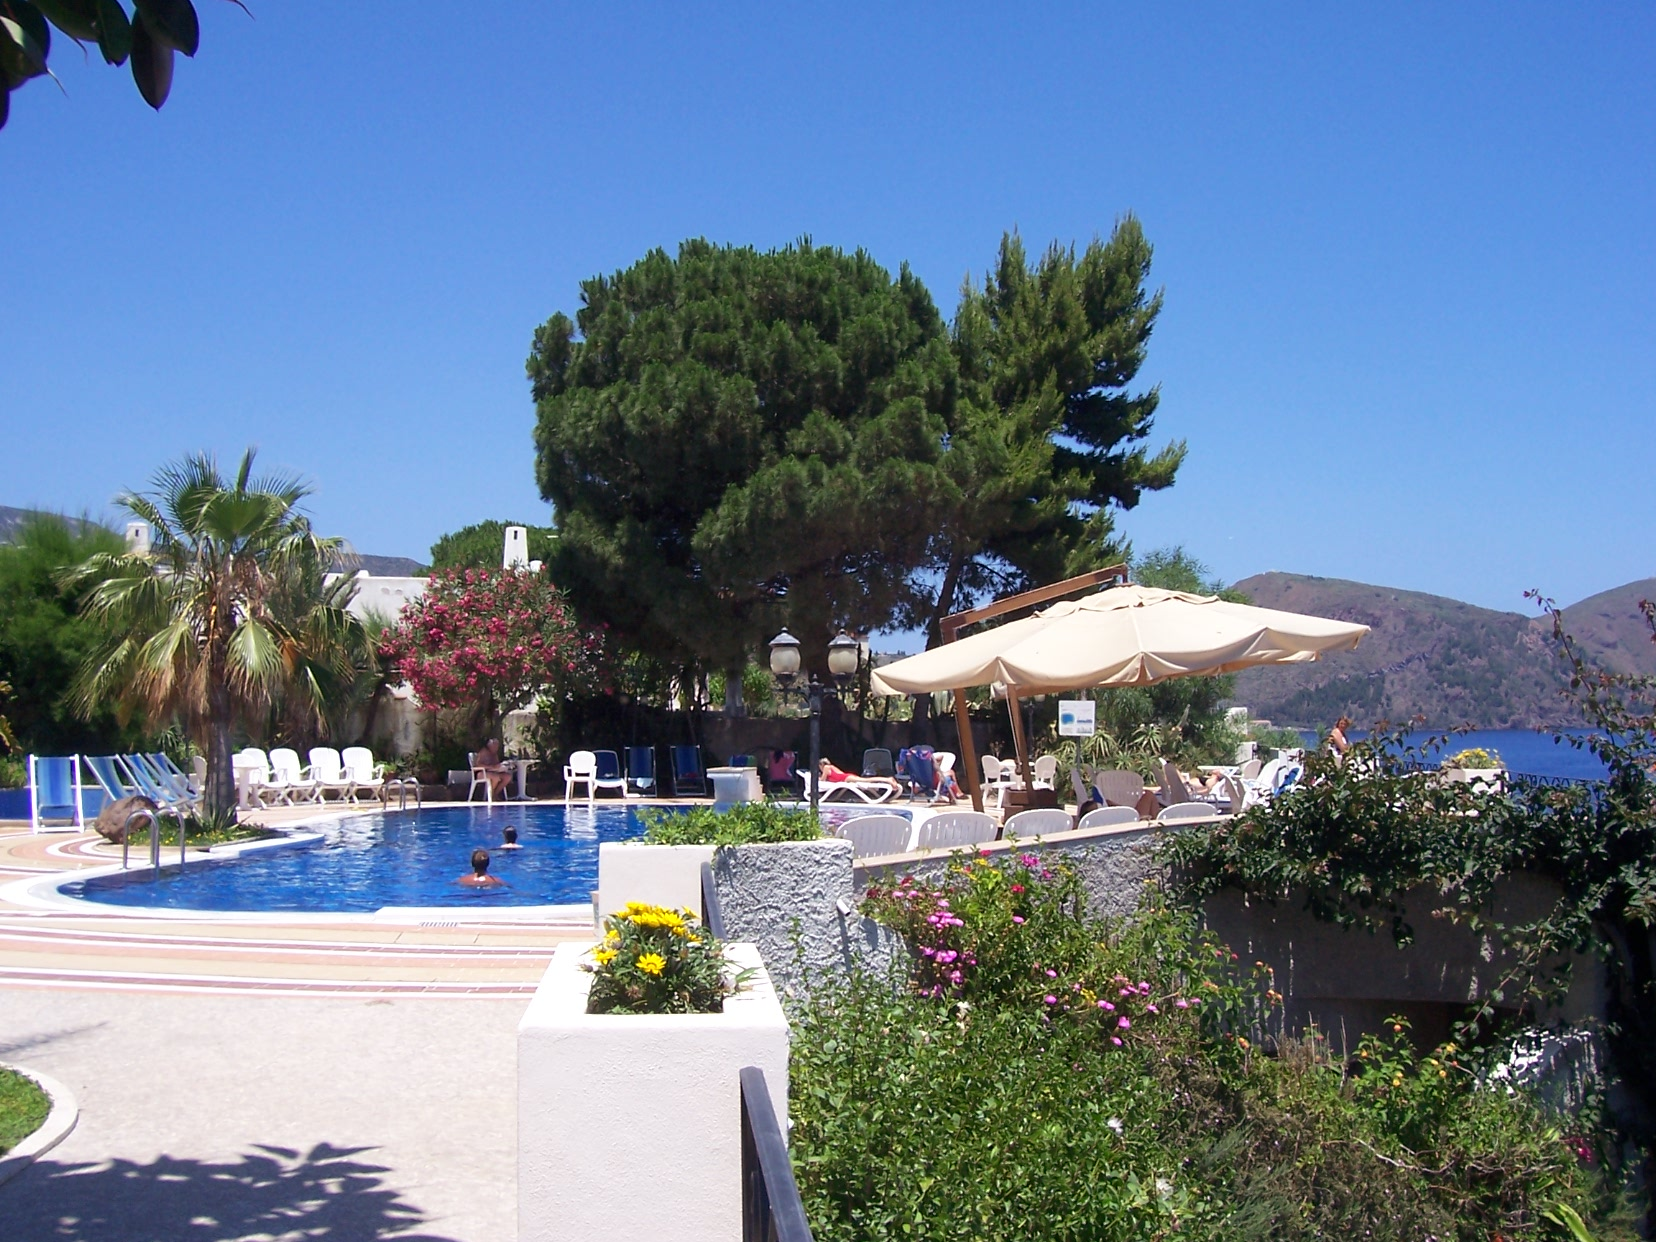 Casa Club Hotel Mit Pool In Lipari Olische Inseln